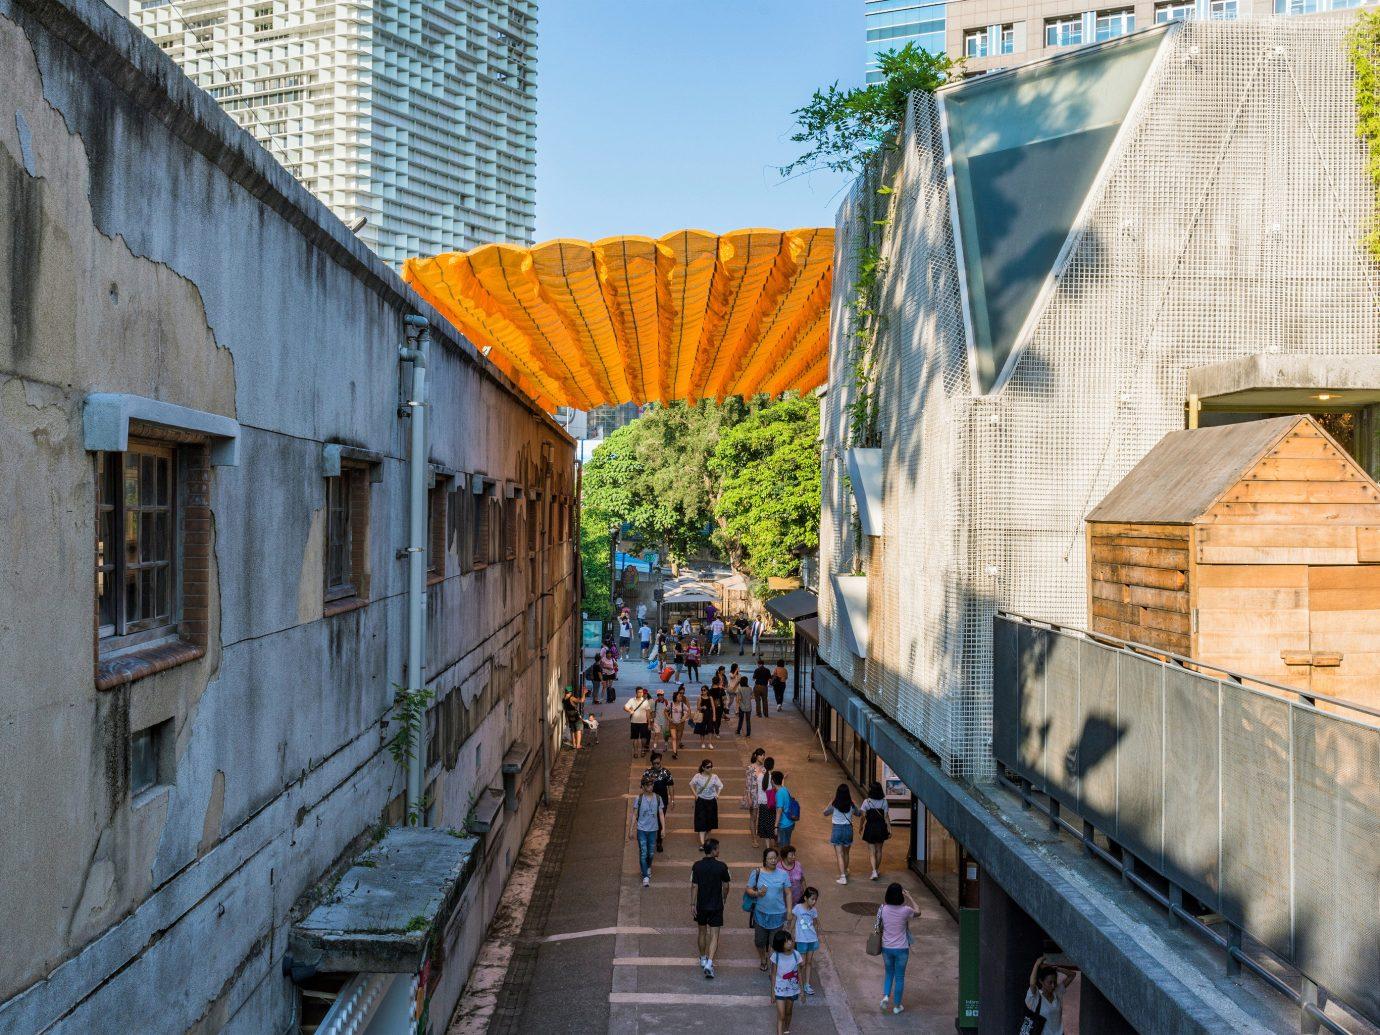 Arts + Culture Taipei Travel Tips Trip Ideas Architecture urban area neighbourhood City sky tree building facade house roof recreation street